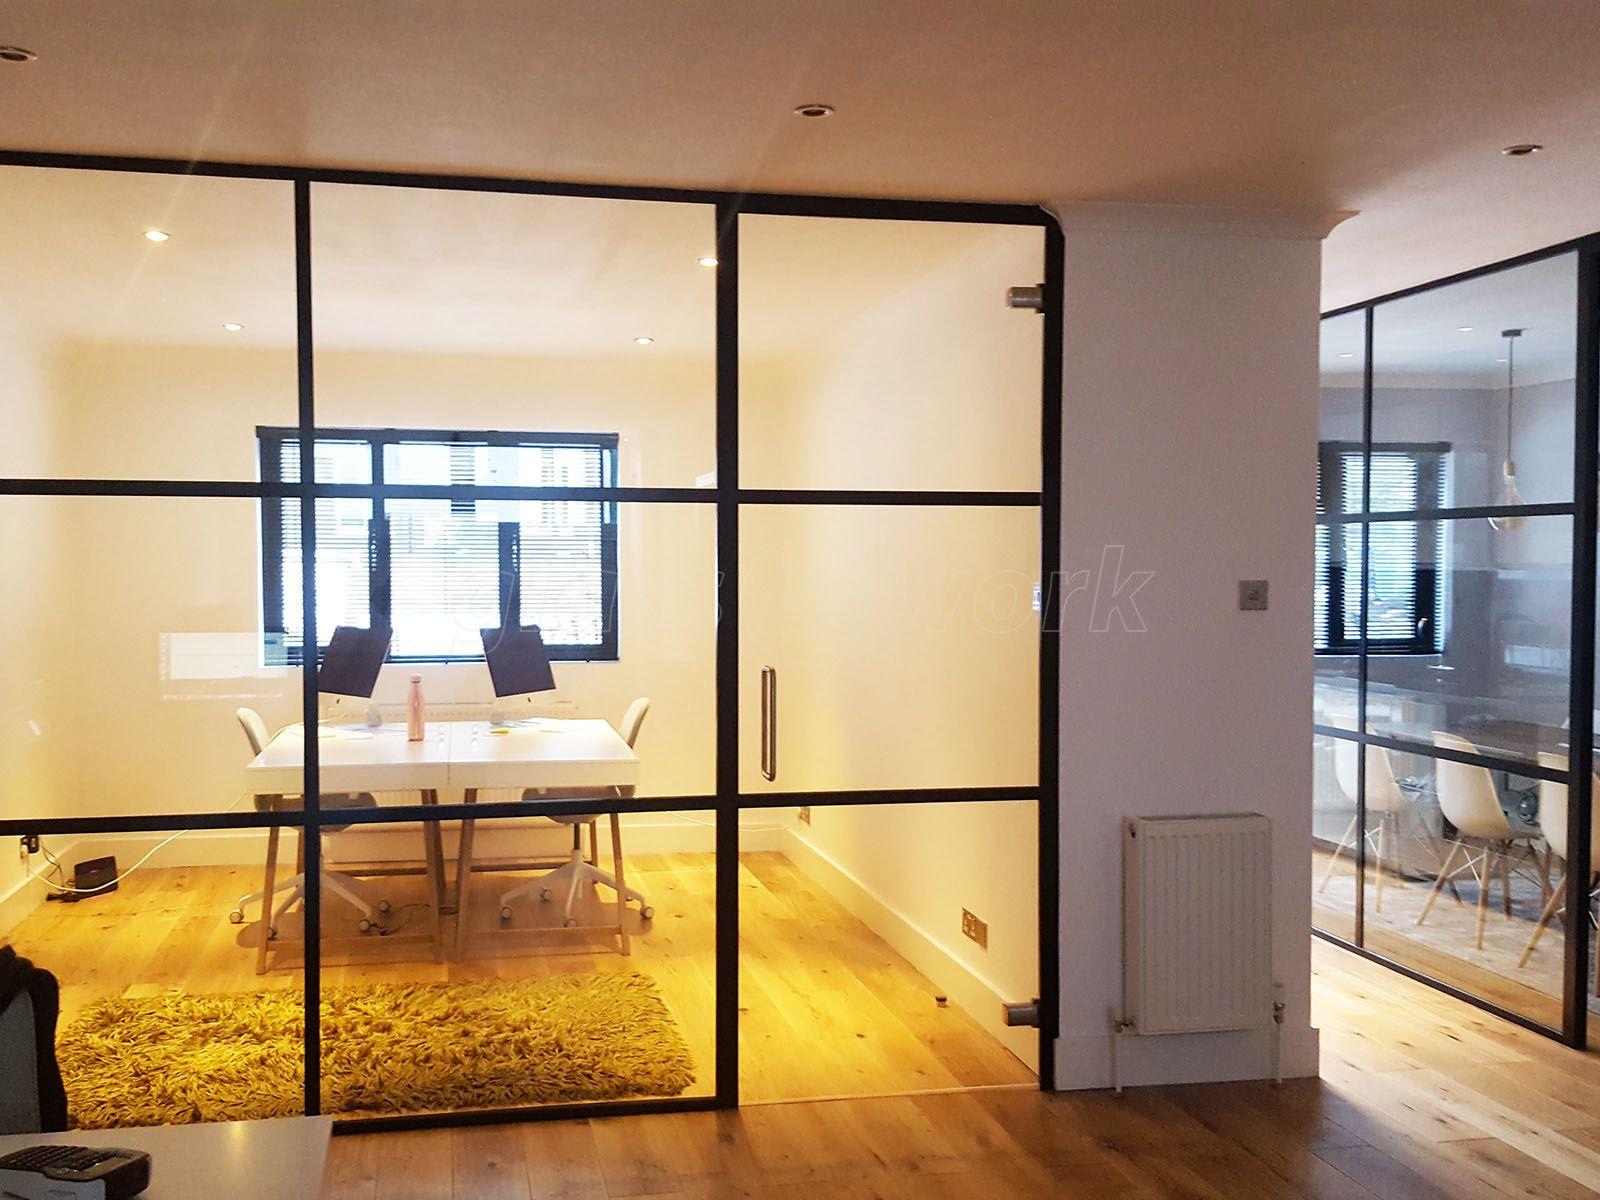 Amazing Glass For Walls Inspiration - Art & Wall Decor - hecatalog.info